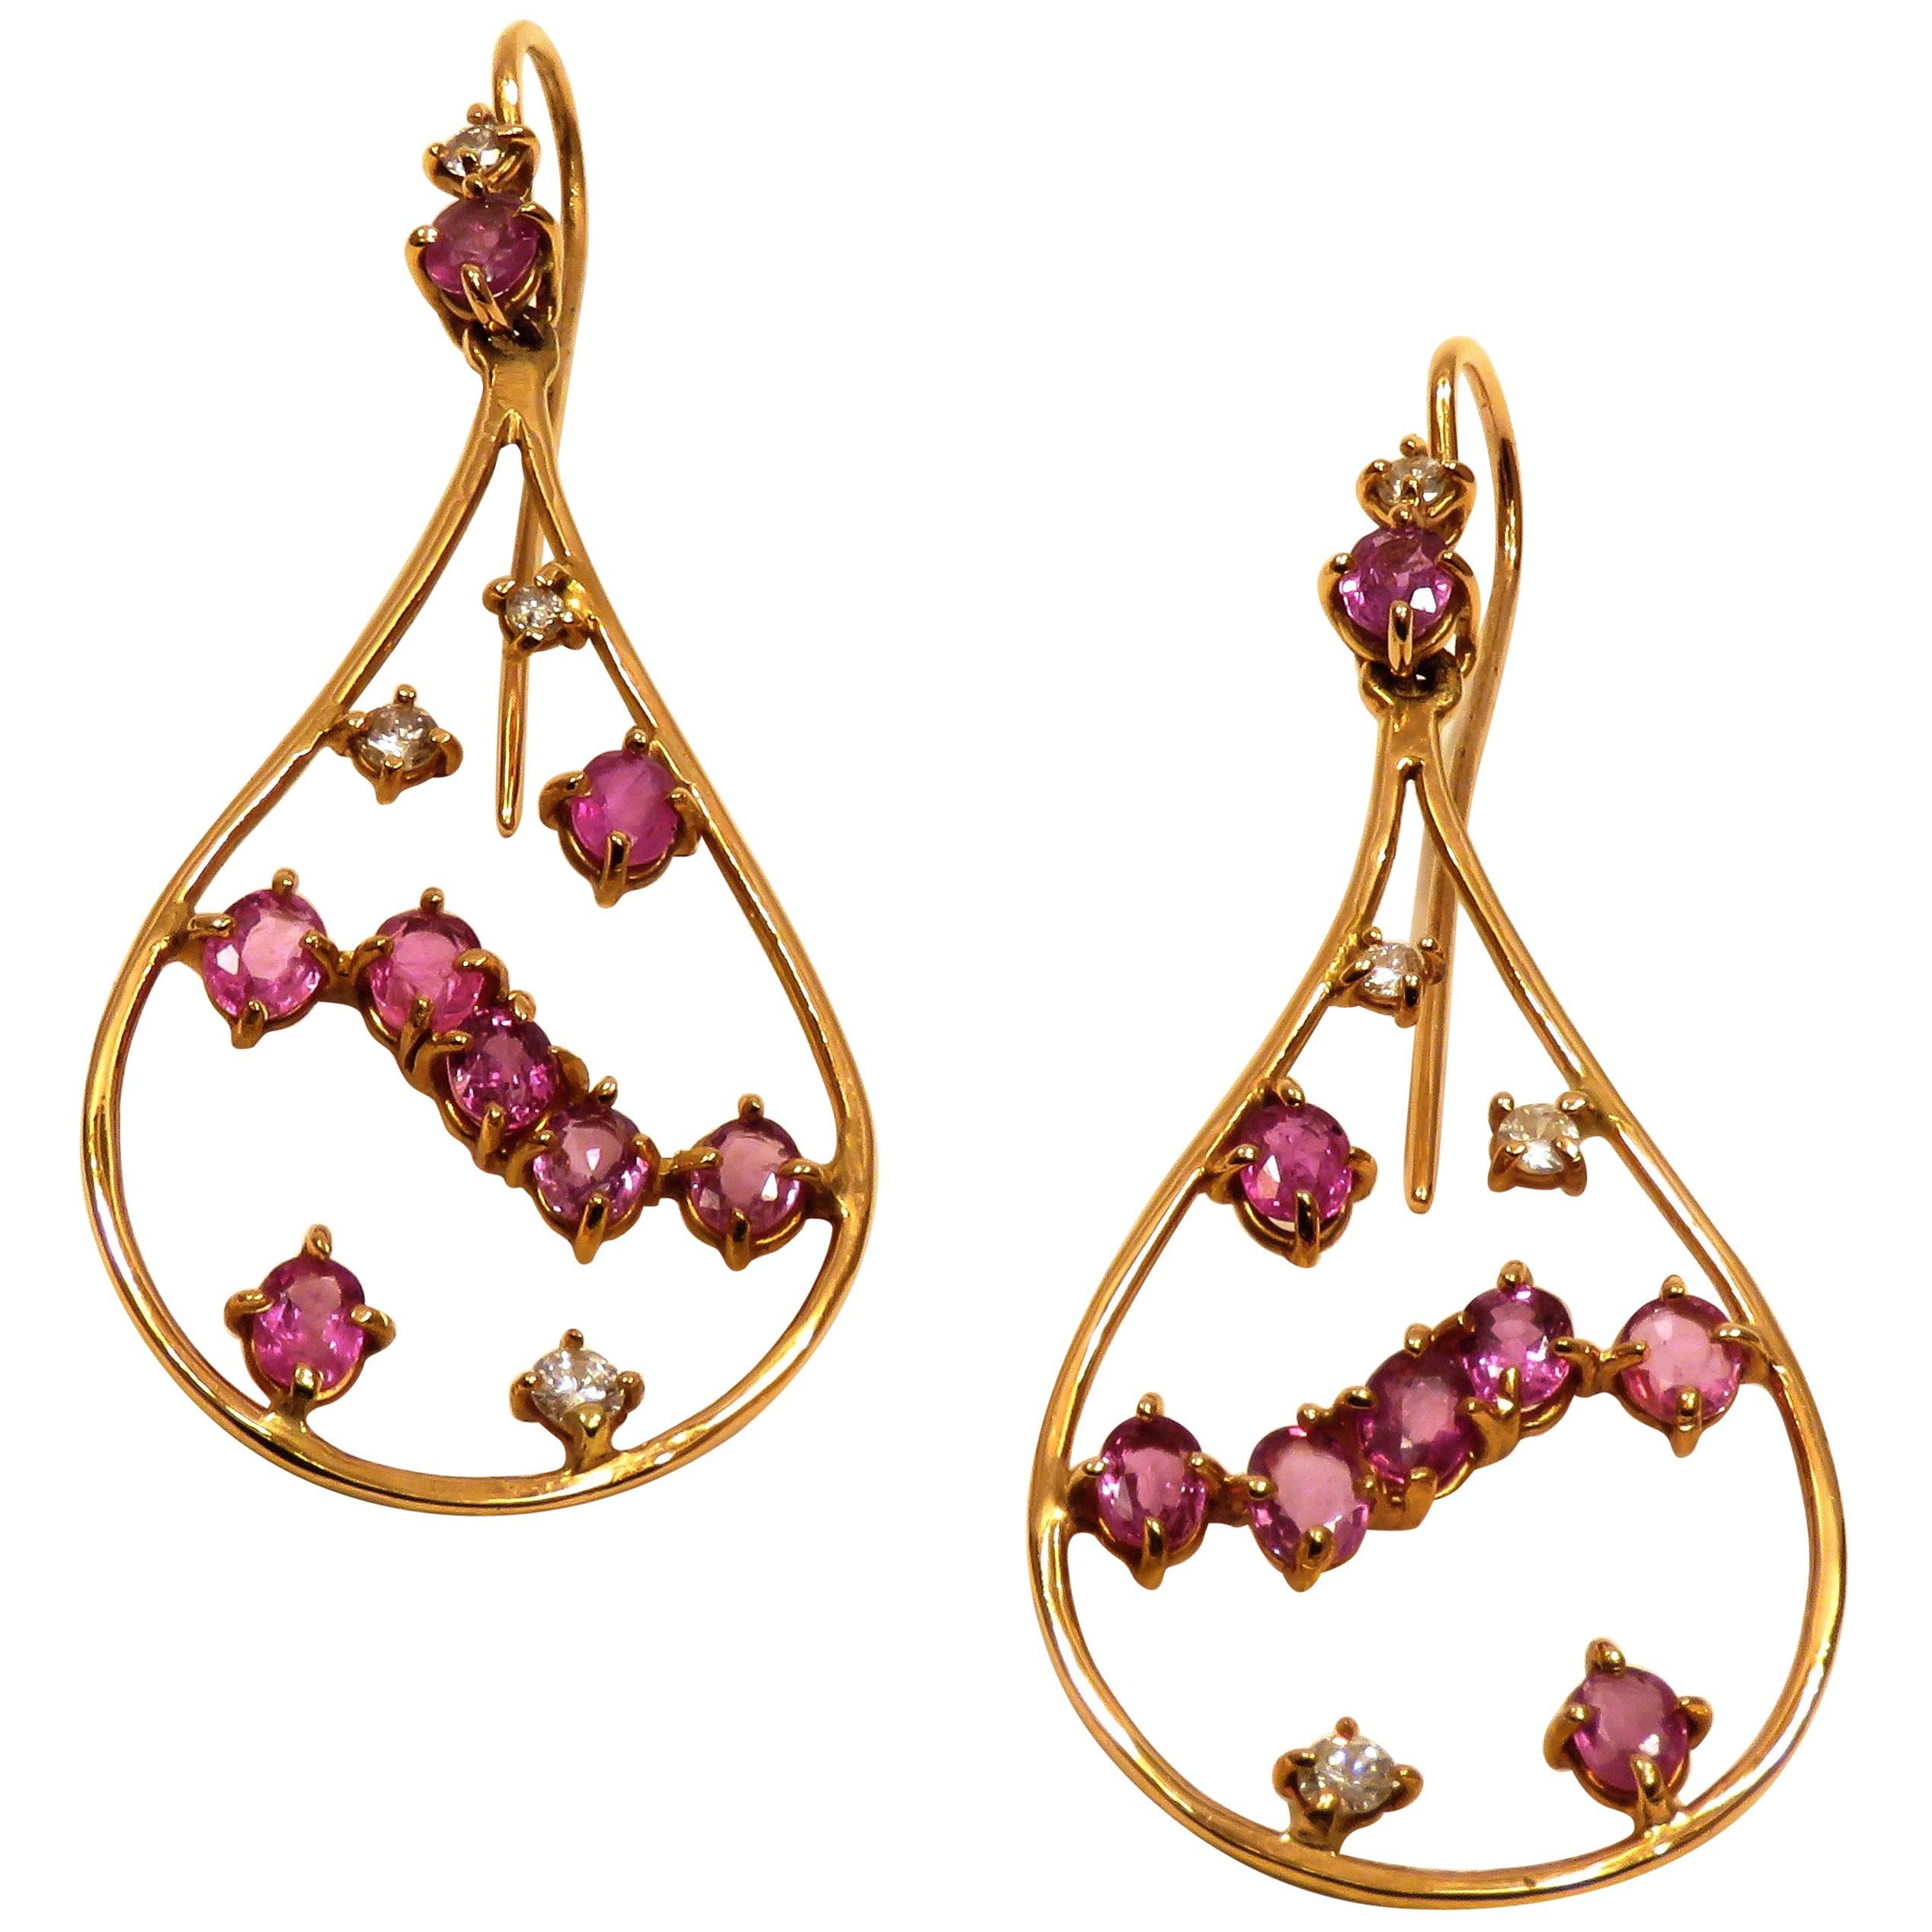 Rose 18 Kt Gold Diamonds Rubies Earrings Handcraft in Italy by Botta Gioielli